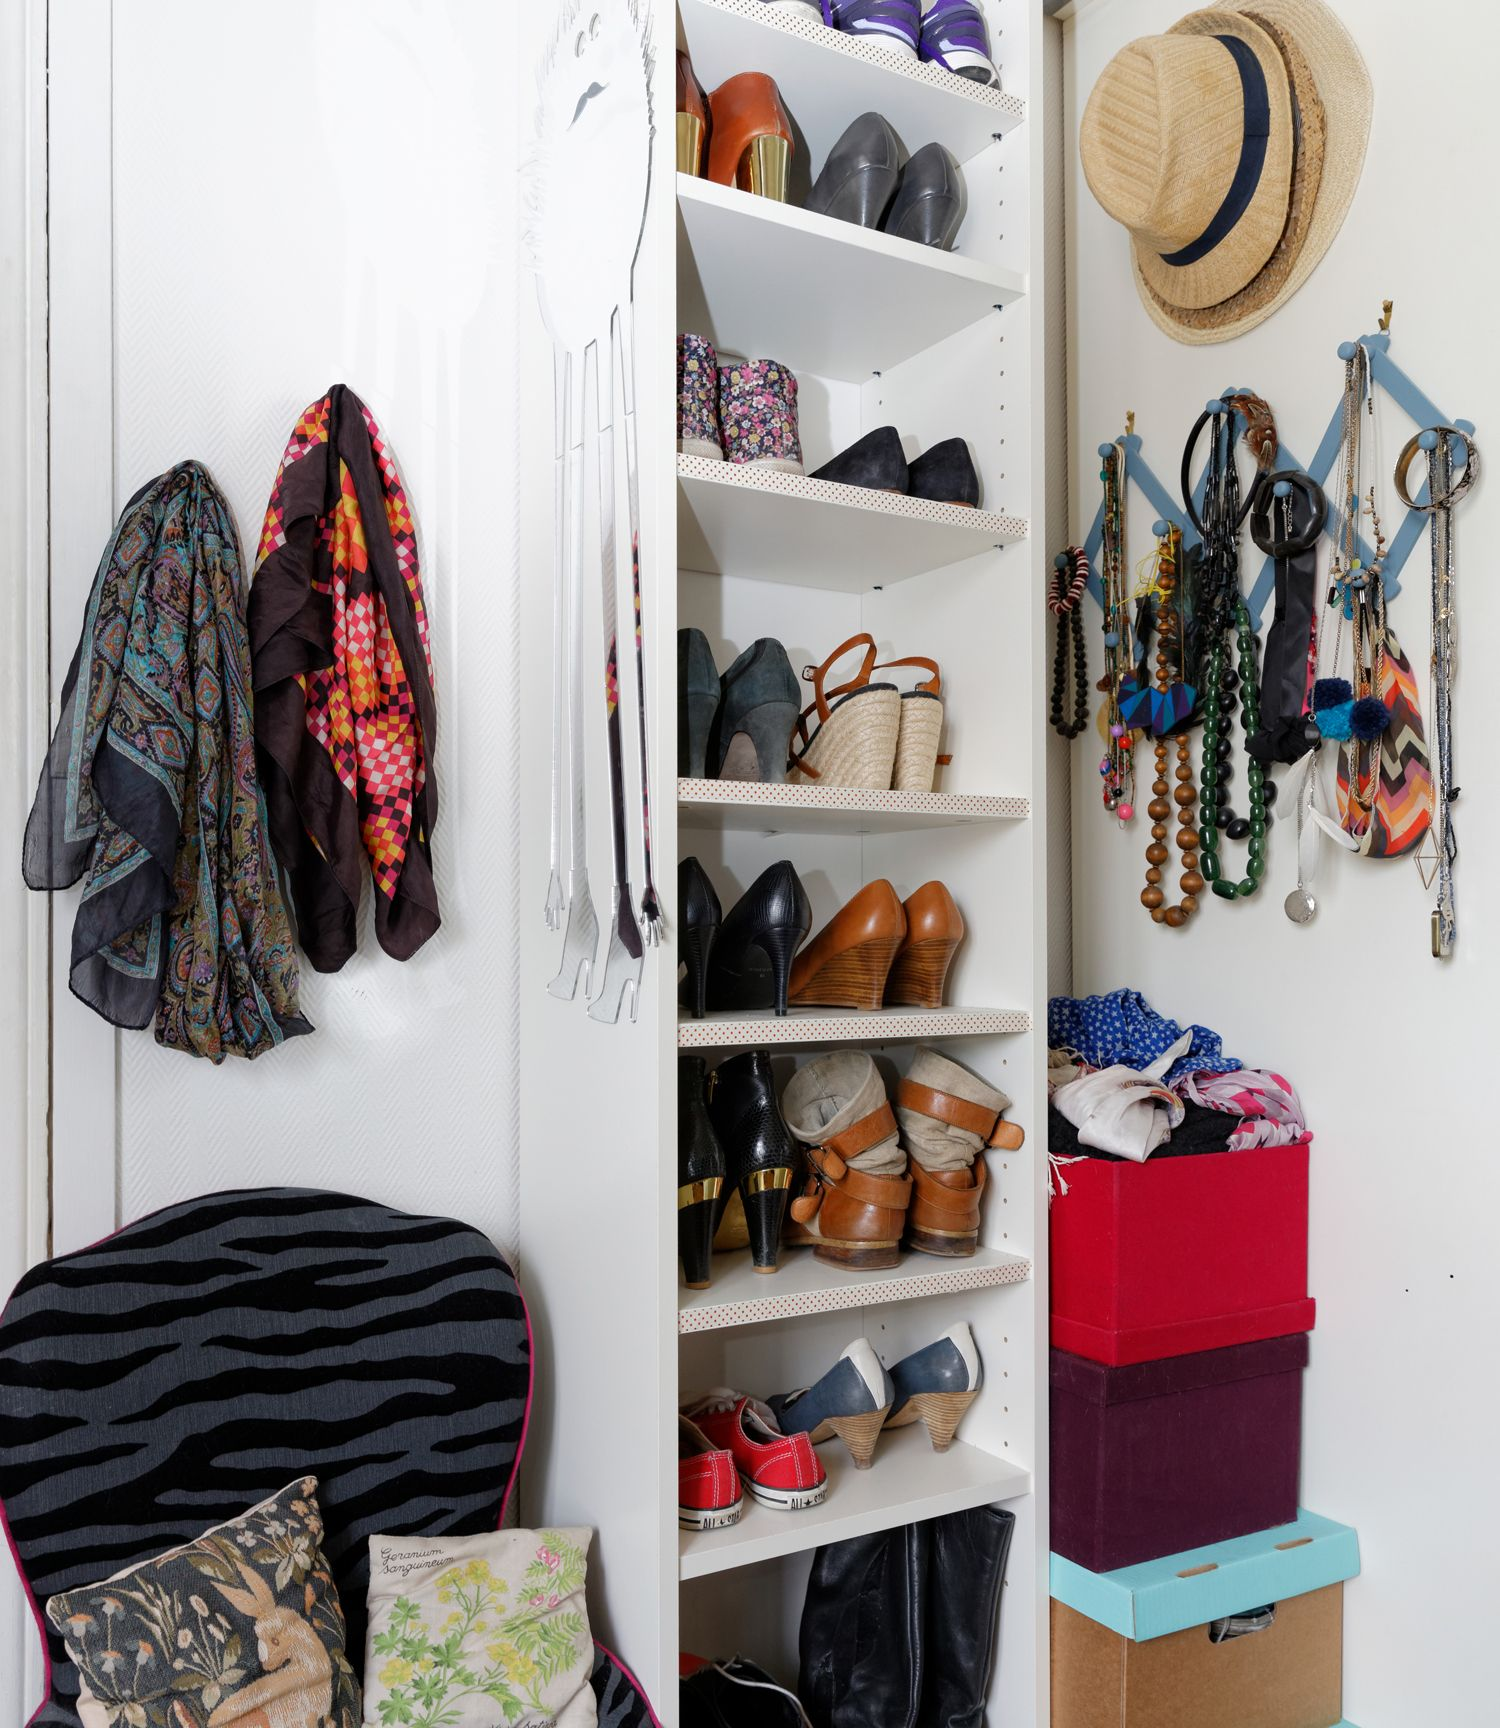 chaussures dans billy troite id es rangement ikea. Black Bedroom Furniture Sets. Home Design Ideas